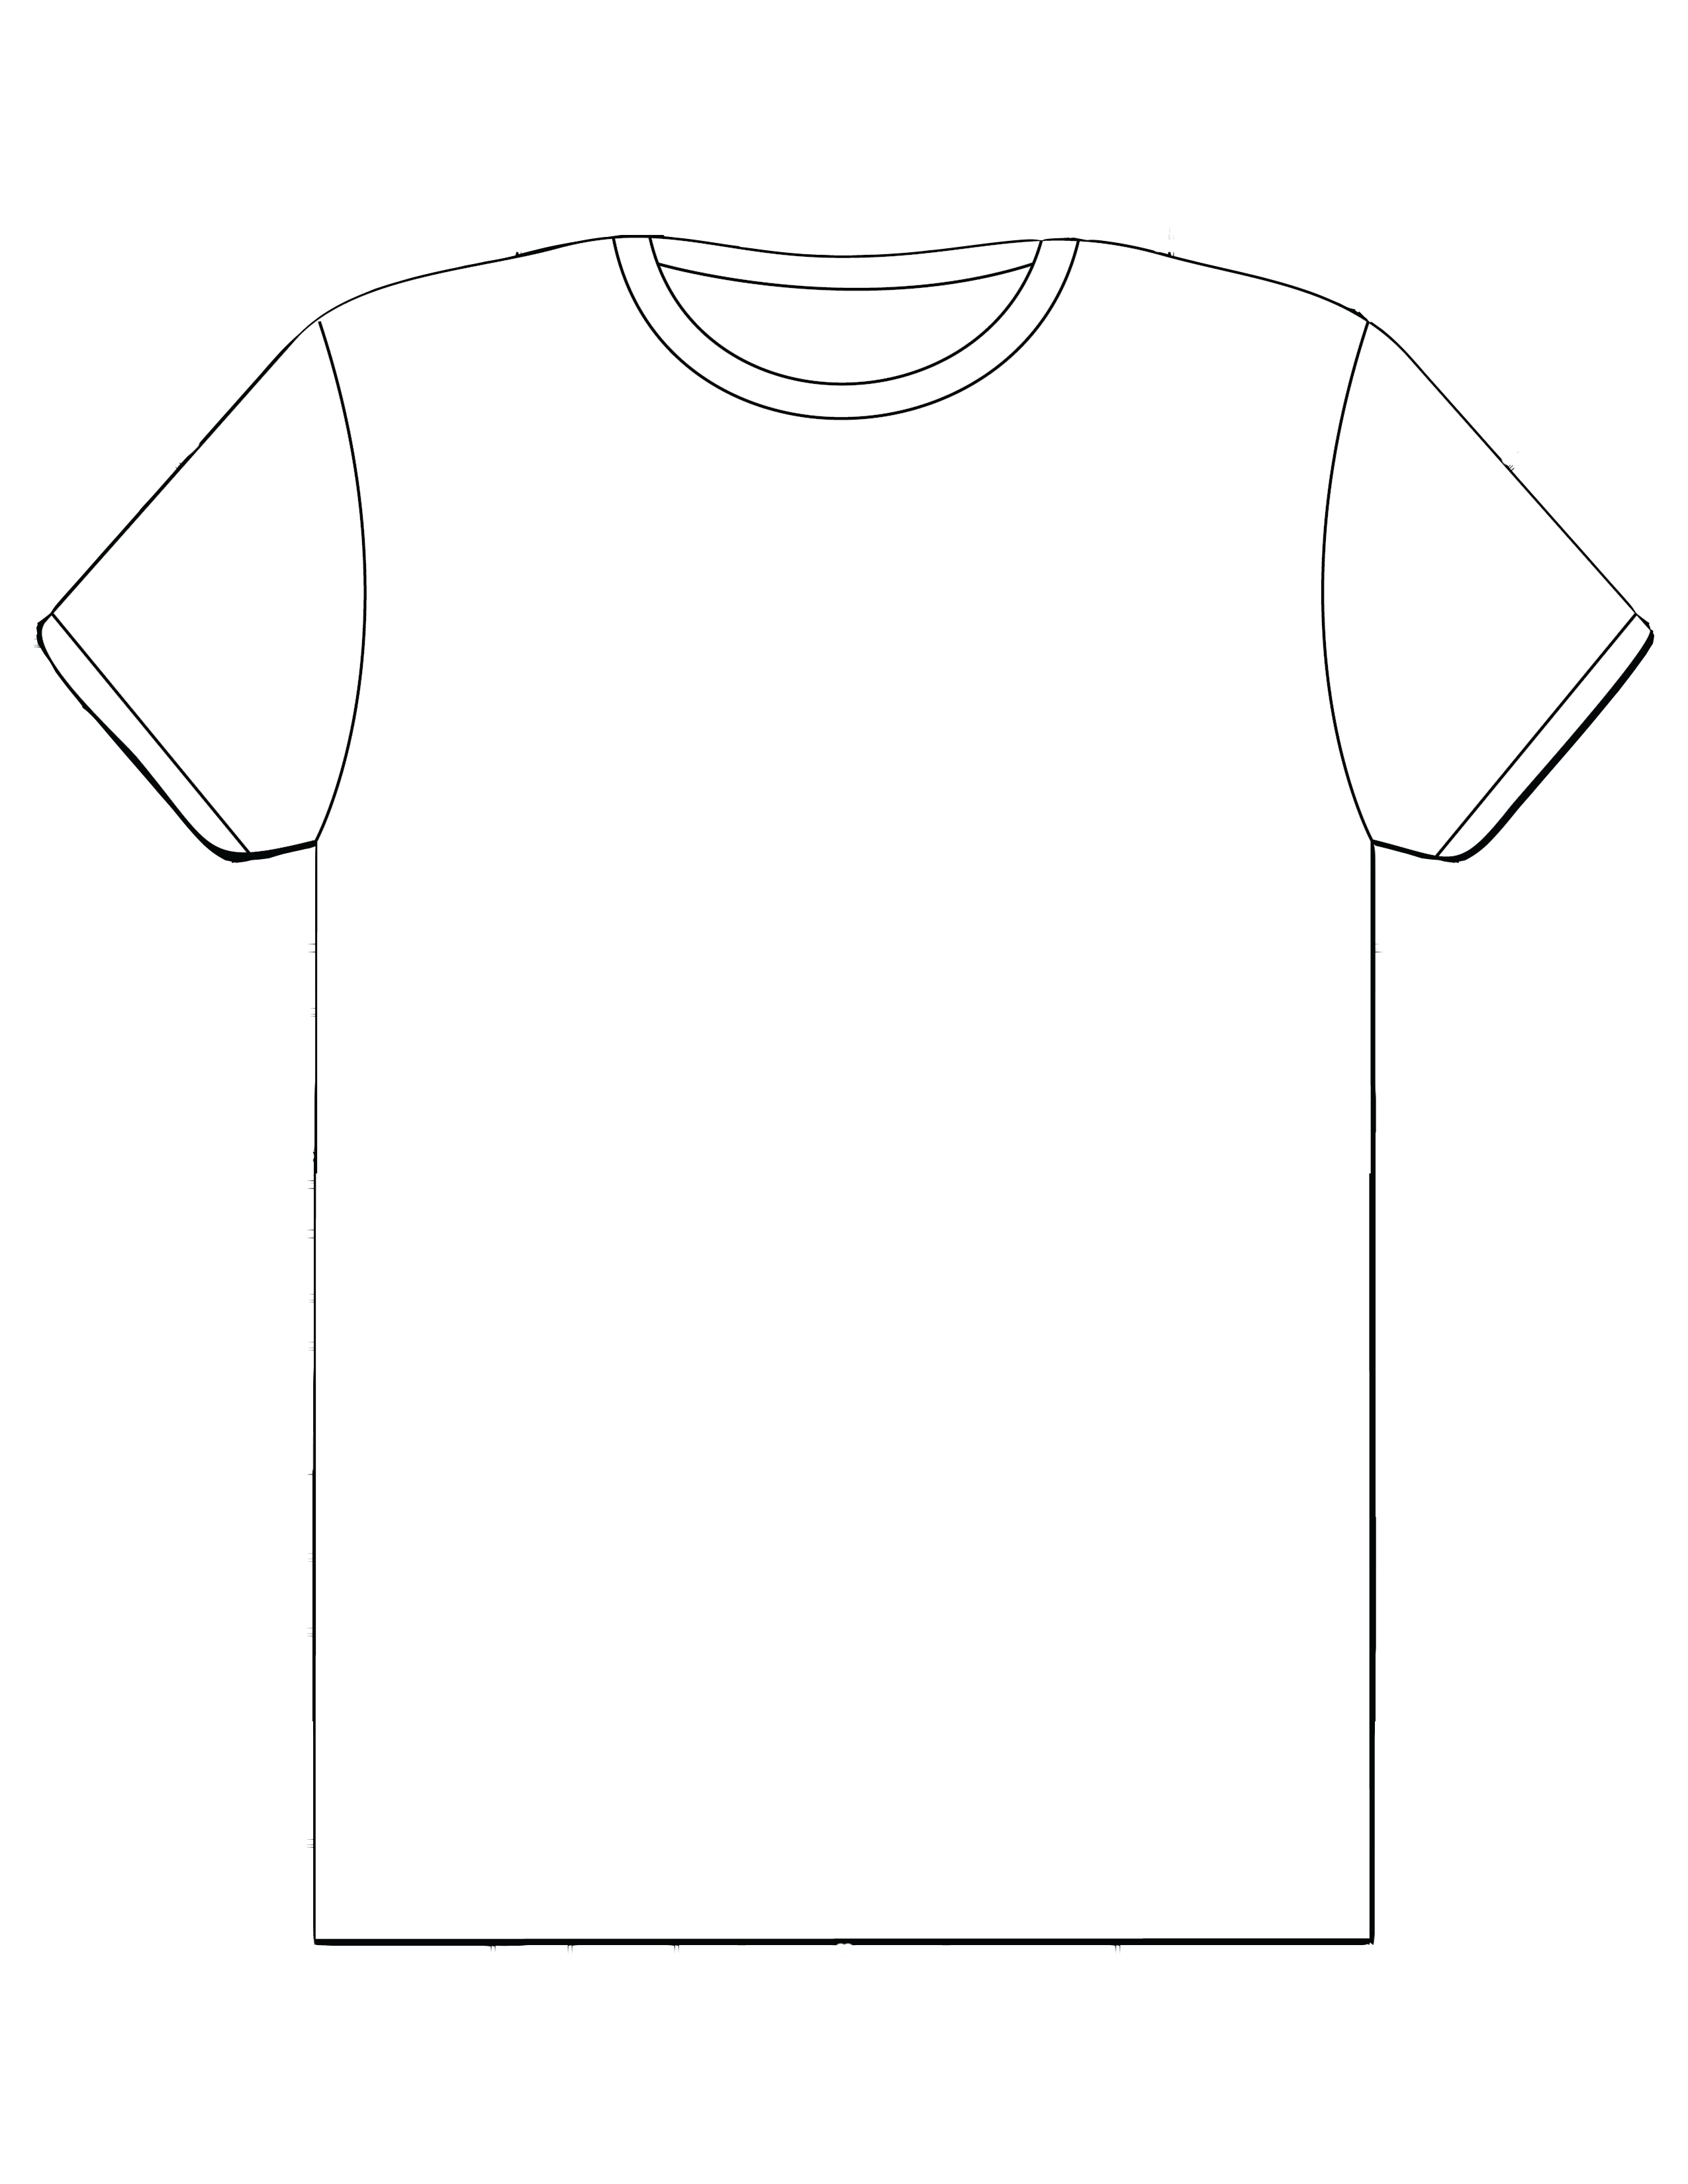 Blank T Shirt Design   April Calendar   April Calendar